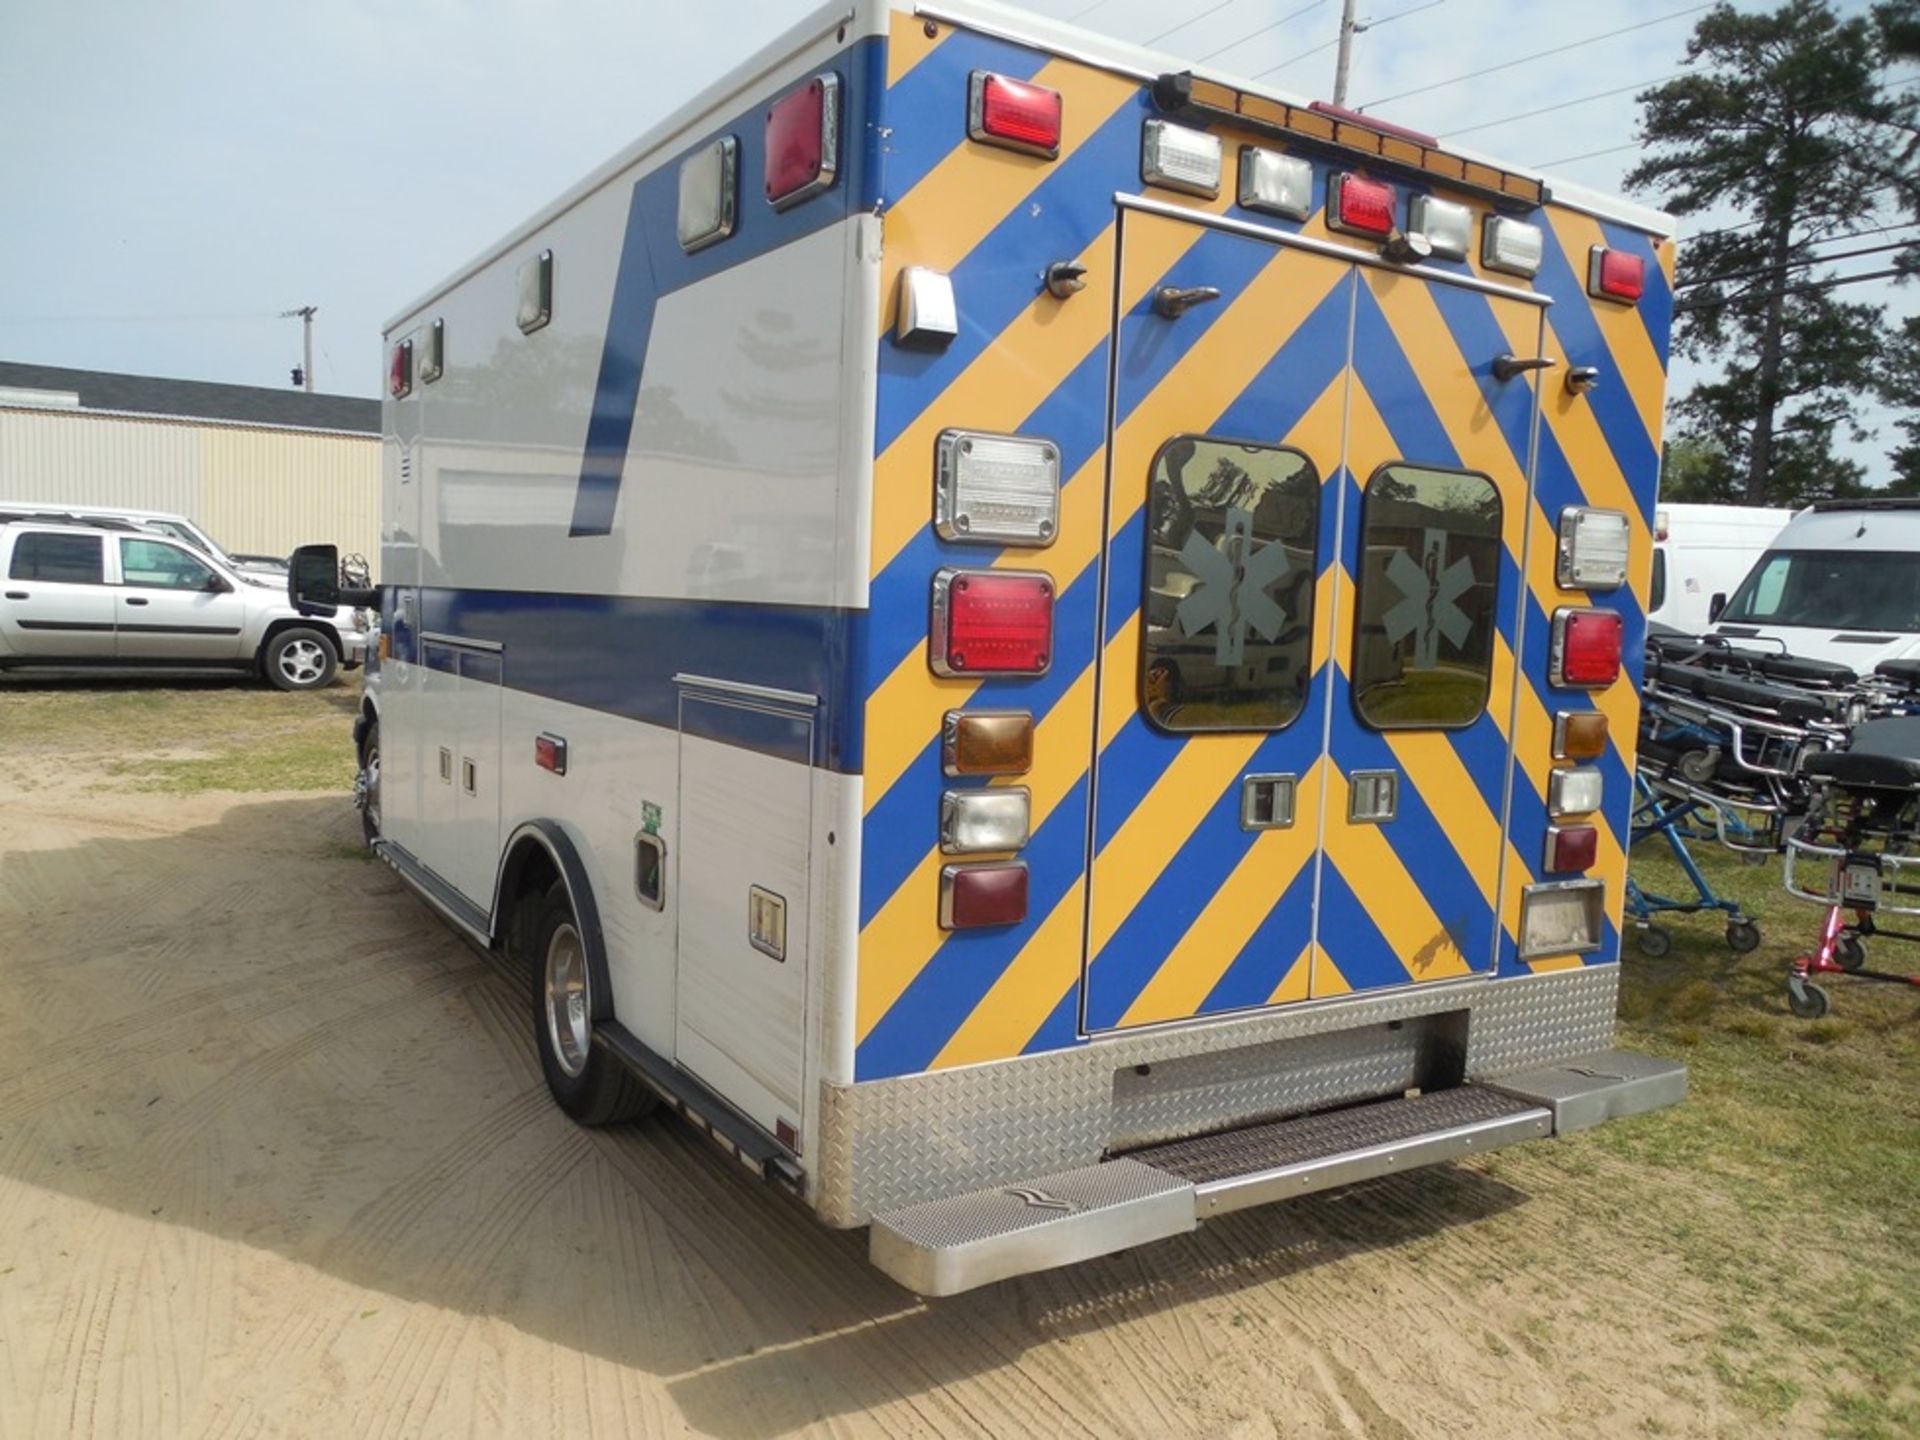 2009 Chev 4500 dsl, box ambulance 226,356 miles vin# 1GBKG316191158061 - Image 5 of 6